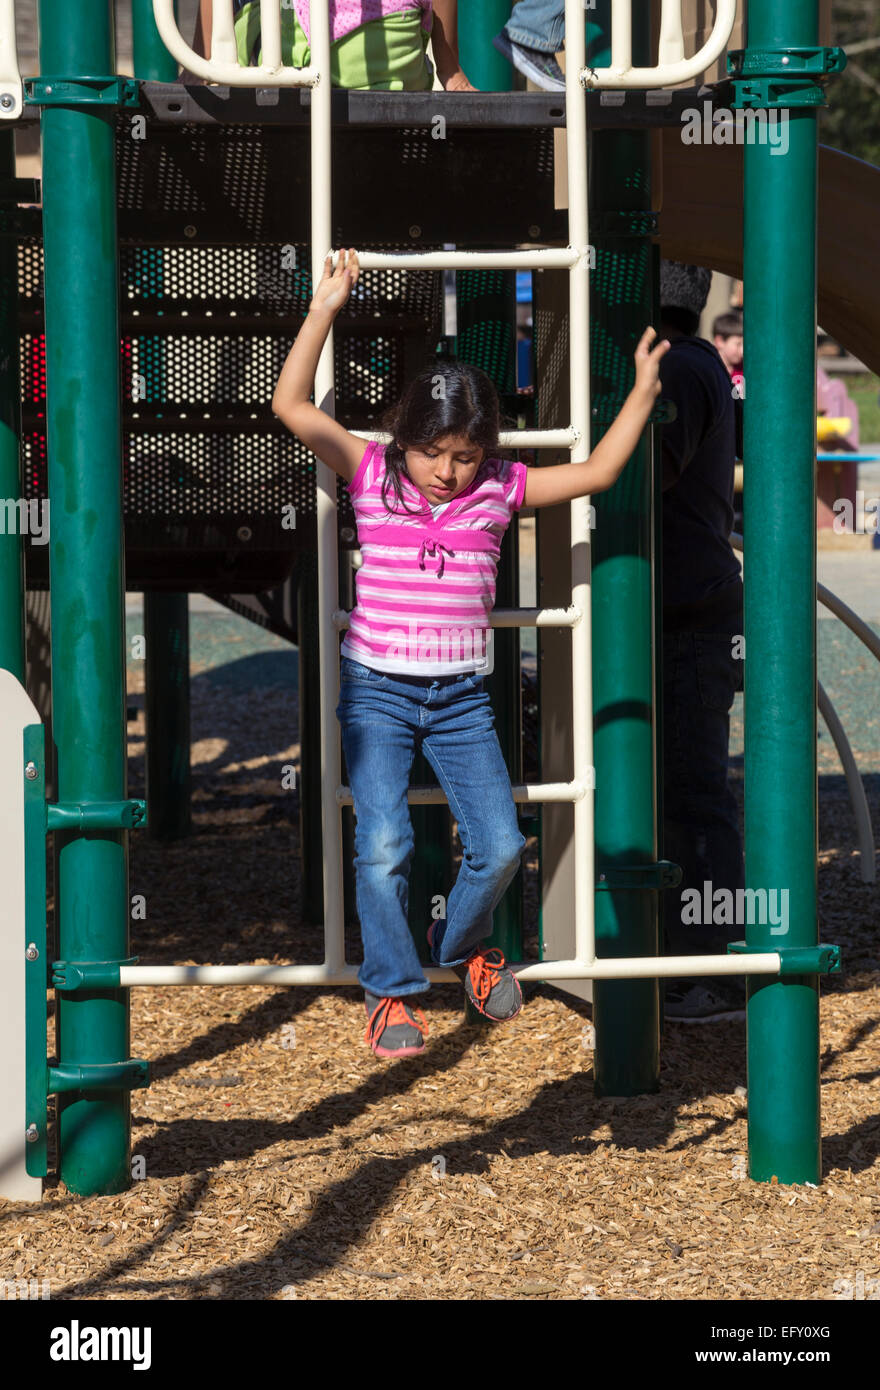 Hispanic girl, young girl, girl, climbing down ladder, playground, Pioneer Park, Novato, California - Stock Image